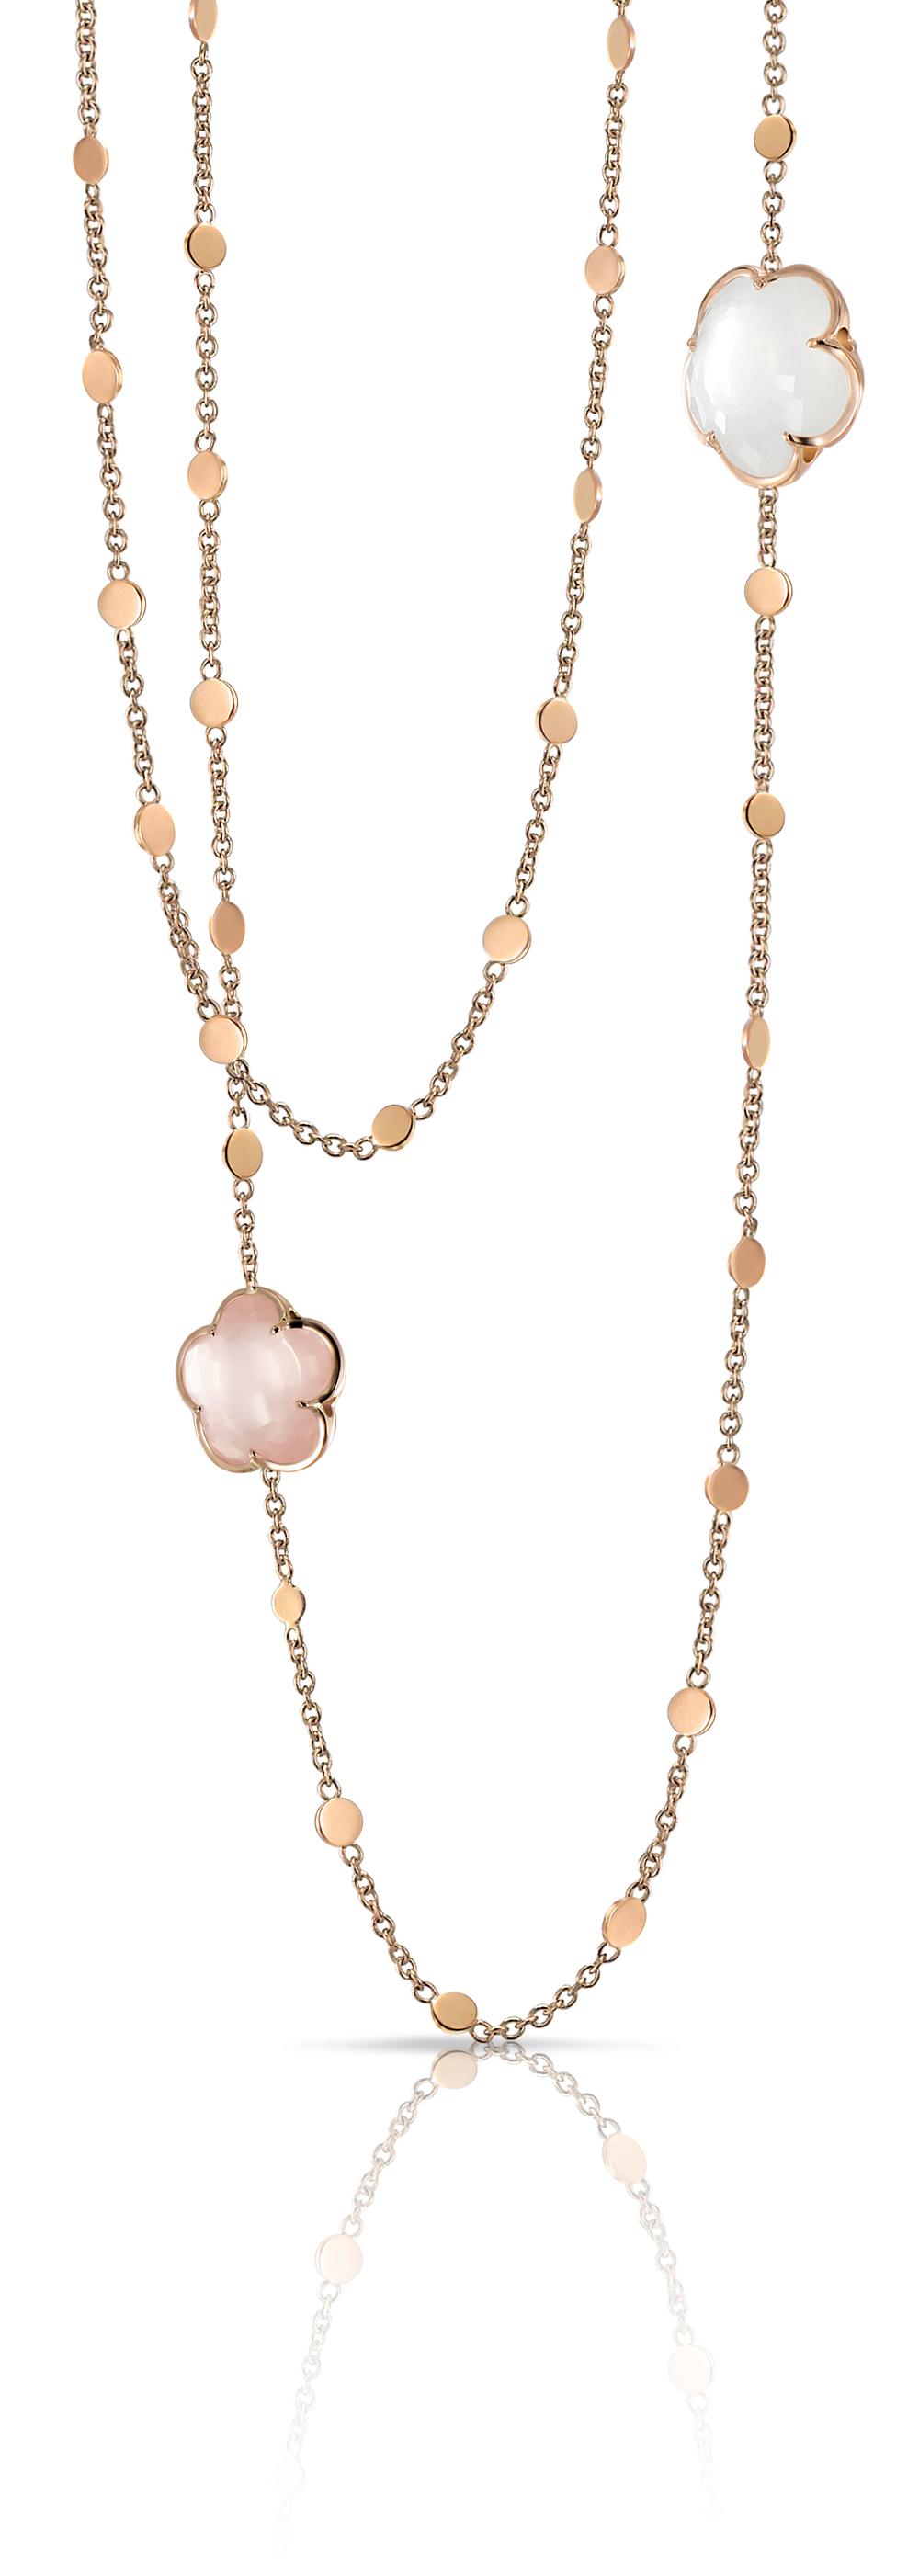 Bon Ton-neklace_milky and pink quartz.jpg